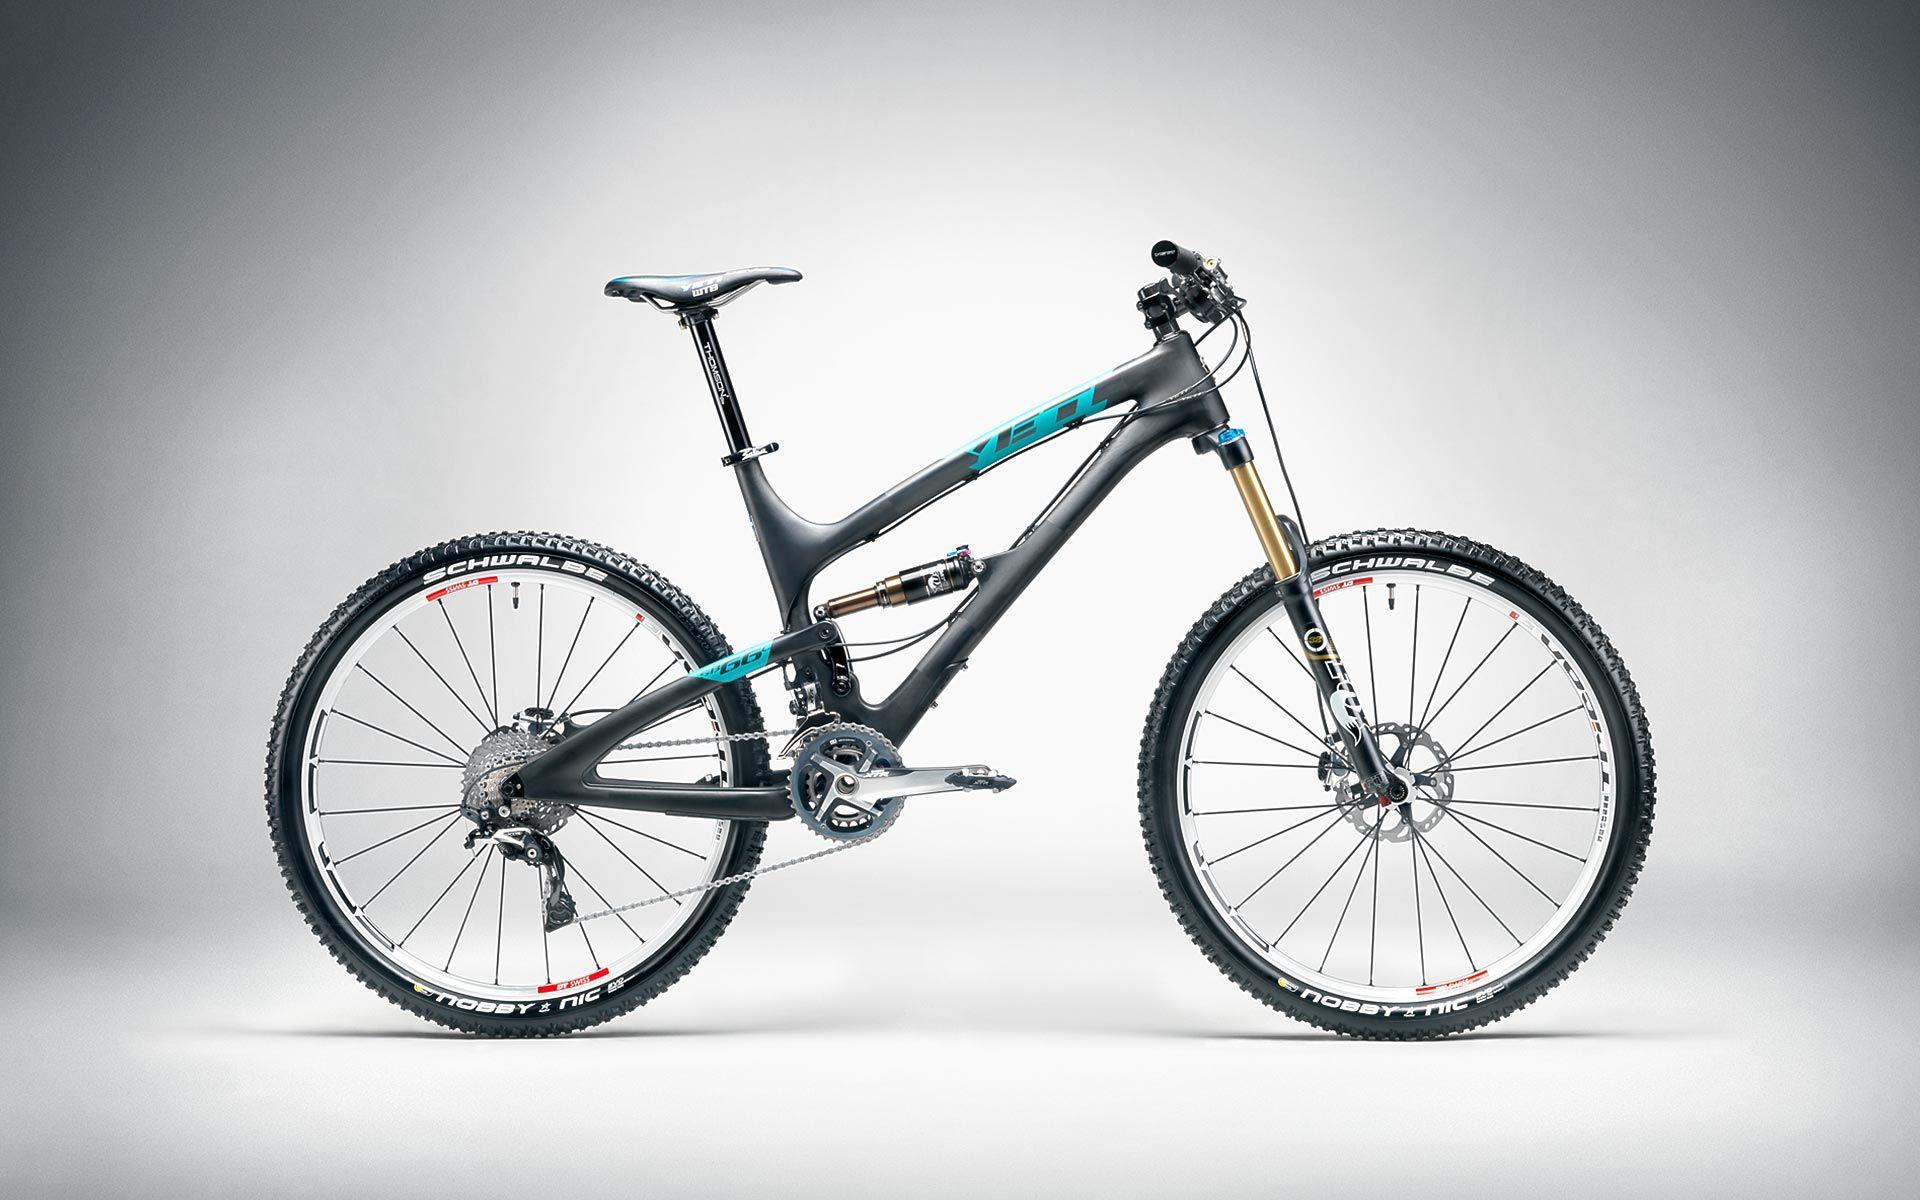 Yeti Sb66 Carbon Forse La Mia Preferita Biking Pinterest